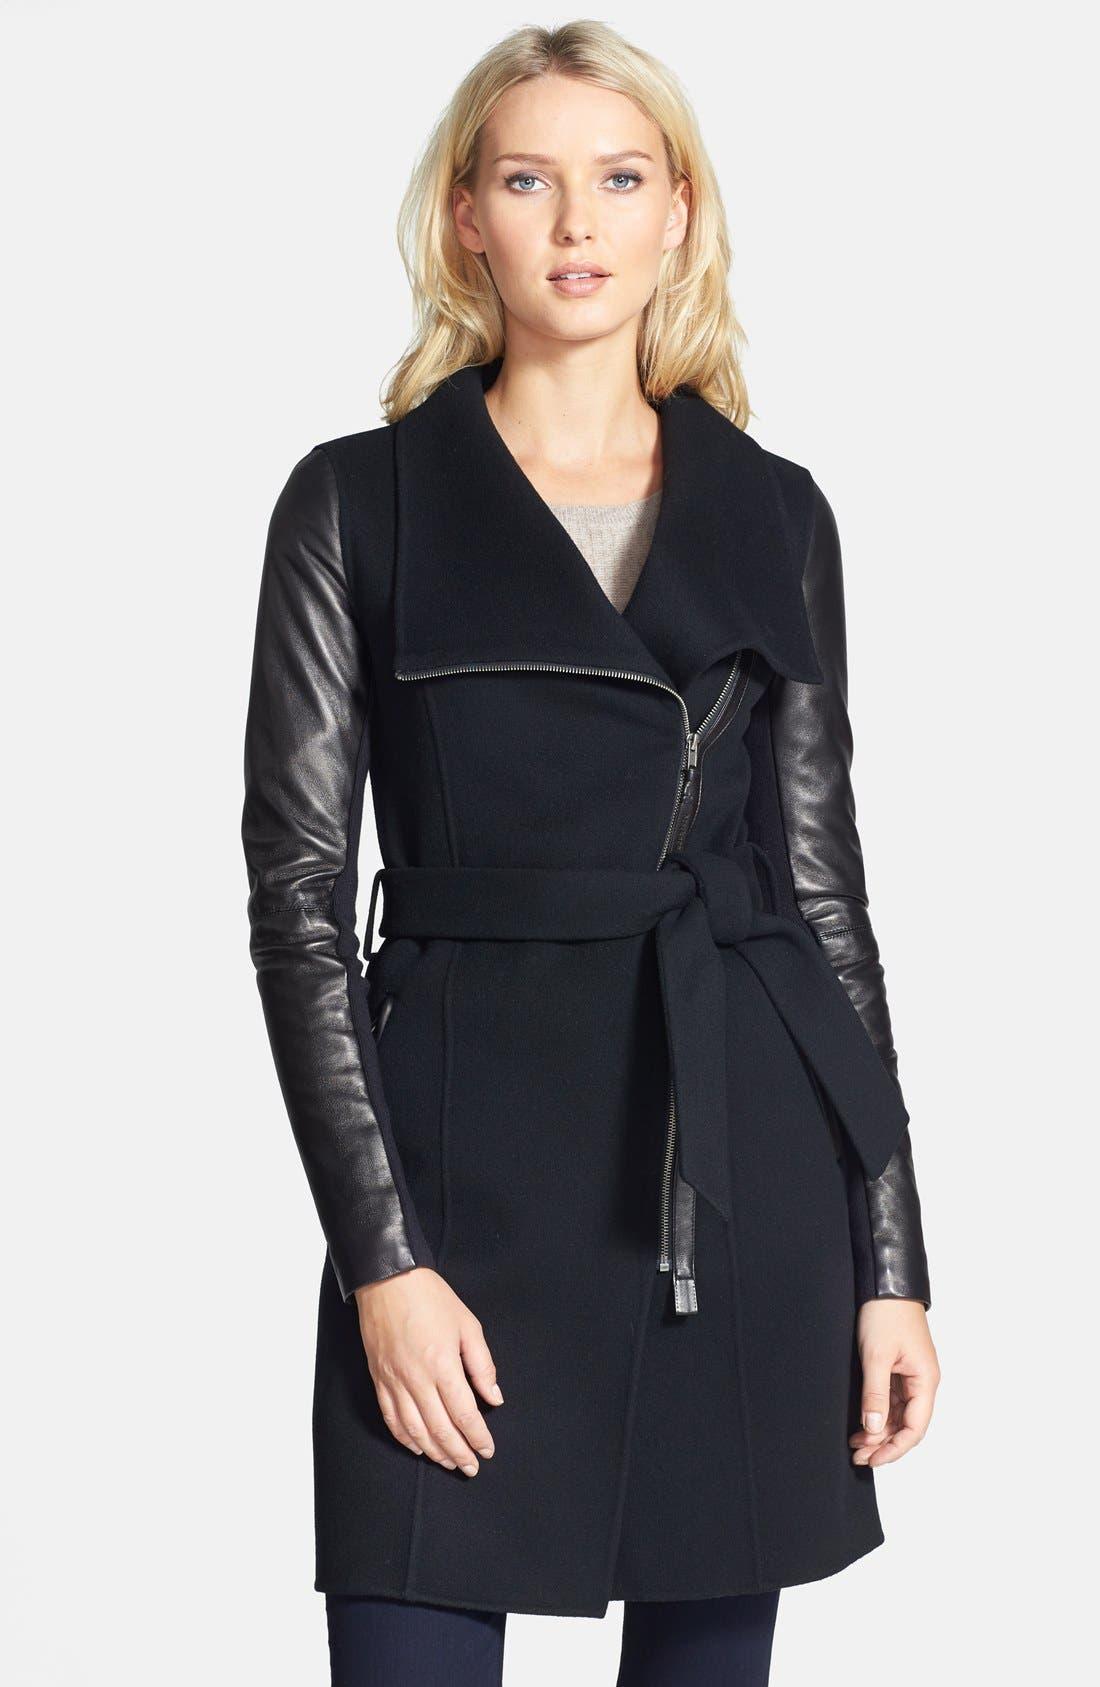 Alternate Image 1 Selected - Mackage 'Hemy' Leather Sleeve Asymmetrical Long Coat